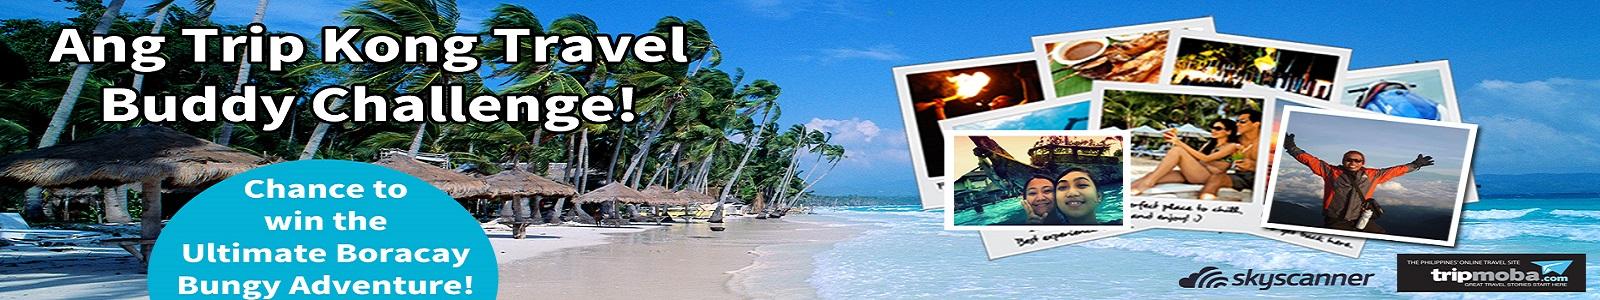 Best travel buddy sites